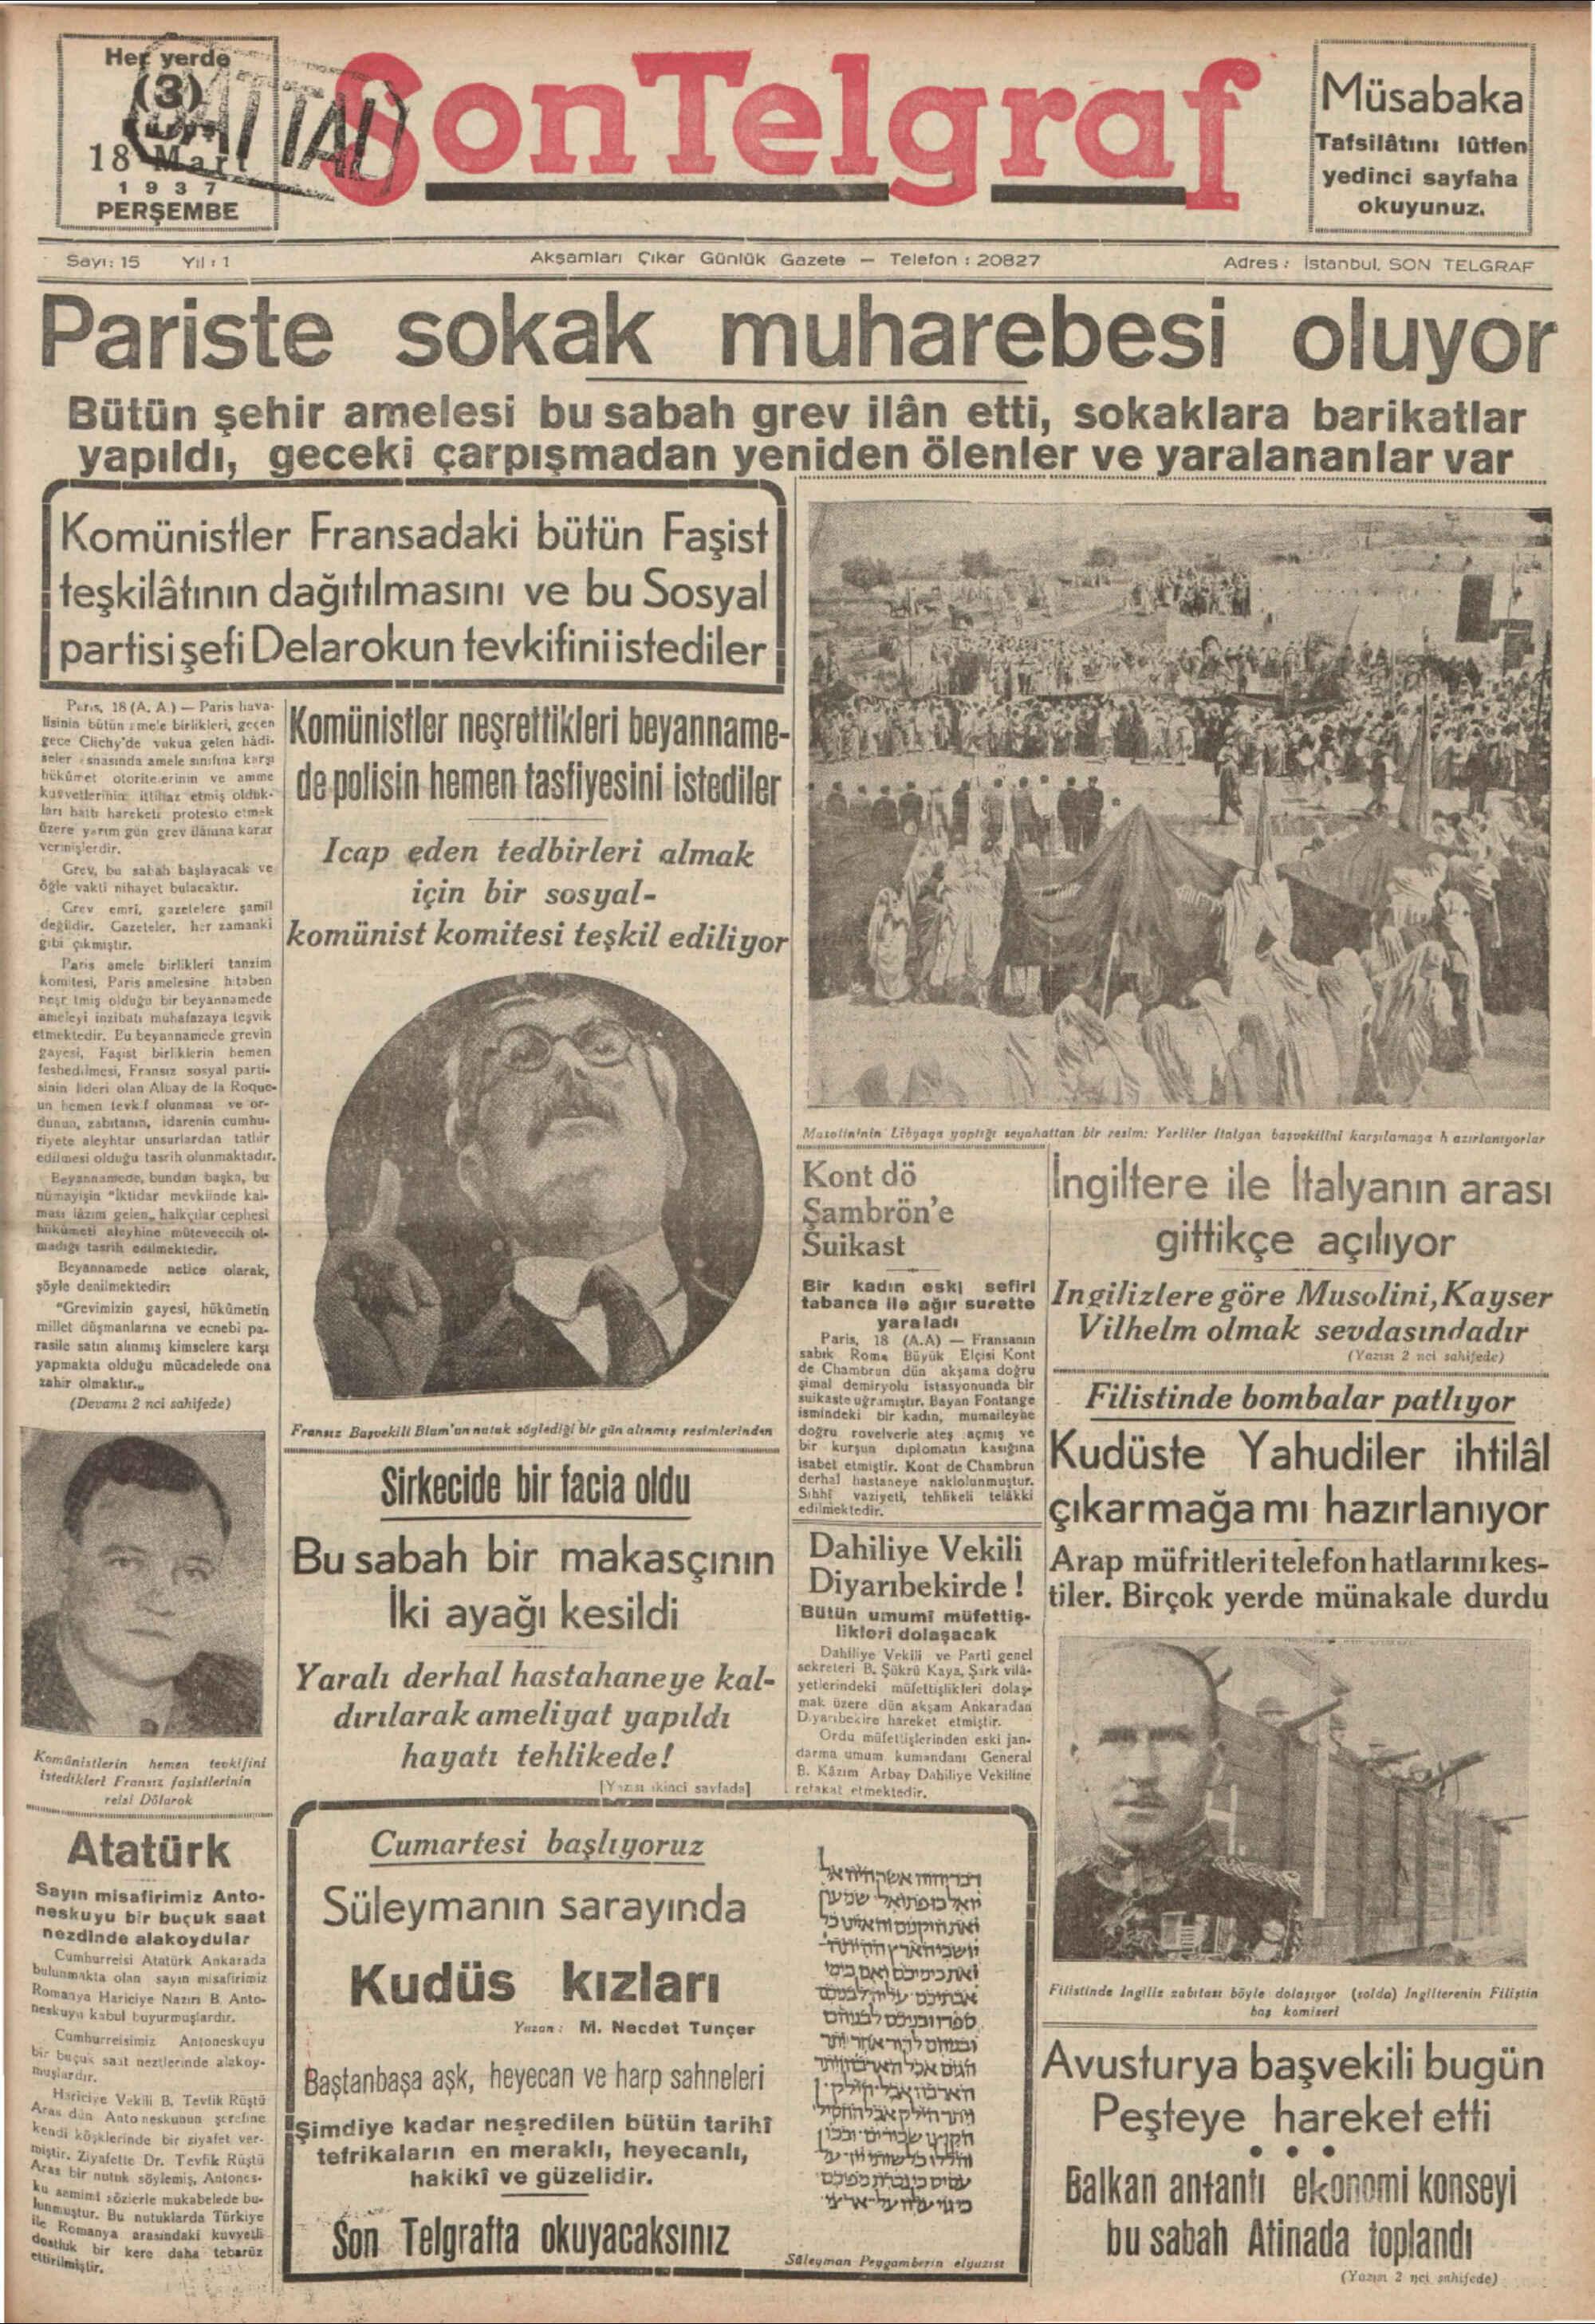 18 Mart 1937 Tarihli Son Telgraf Gazetesi Sayfa 1